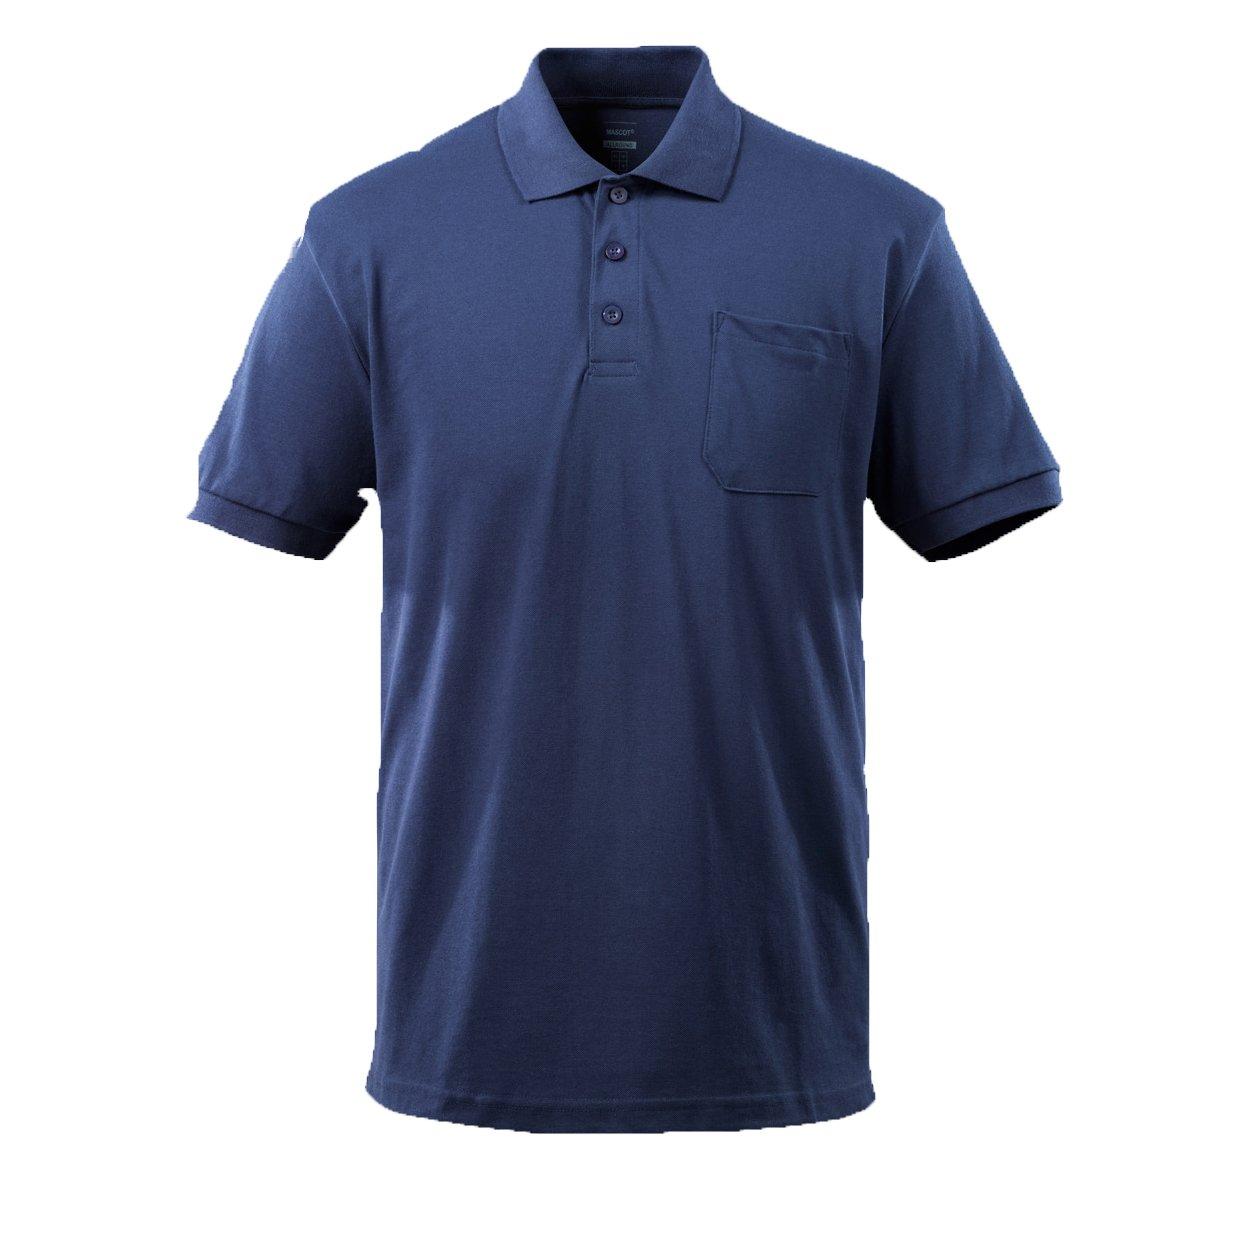 Mascot 51586-968-01-3XL Polo-ShirtOrgon Size 3XL Navy Blue